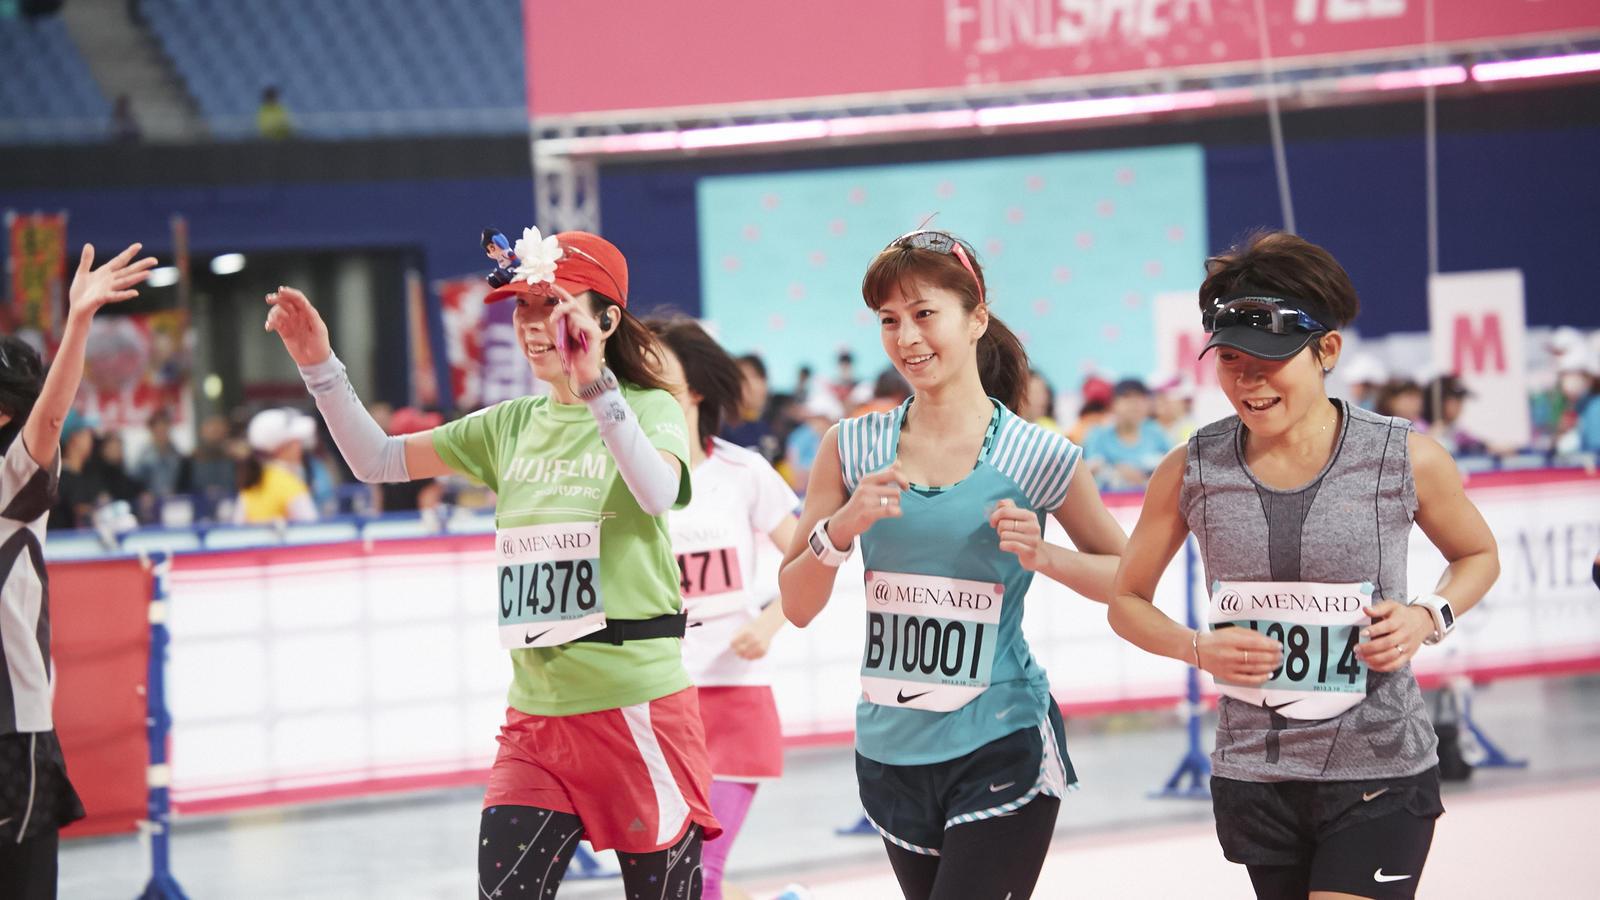 nagoya women 2019年3月10日に開催される名古屋ウィメンズマラソンの公式サイトです.